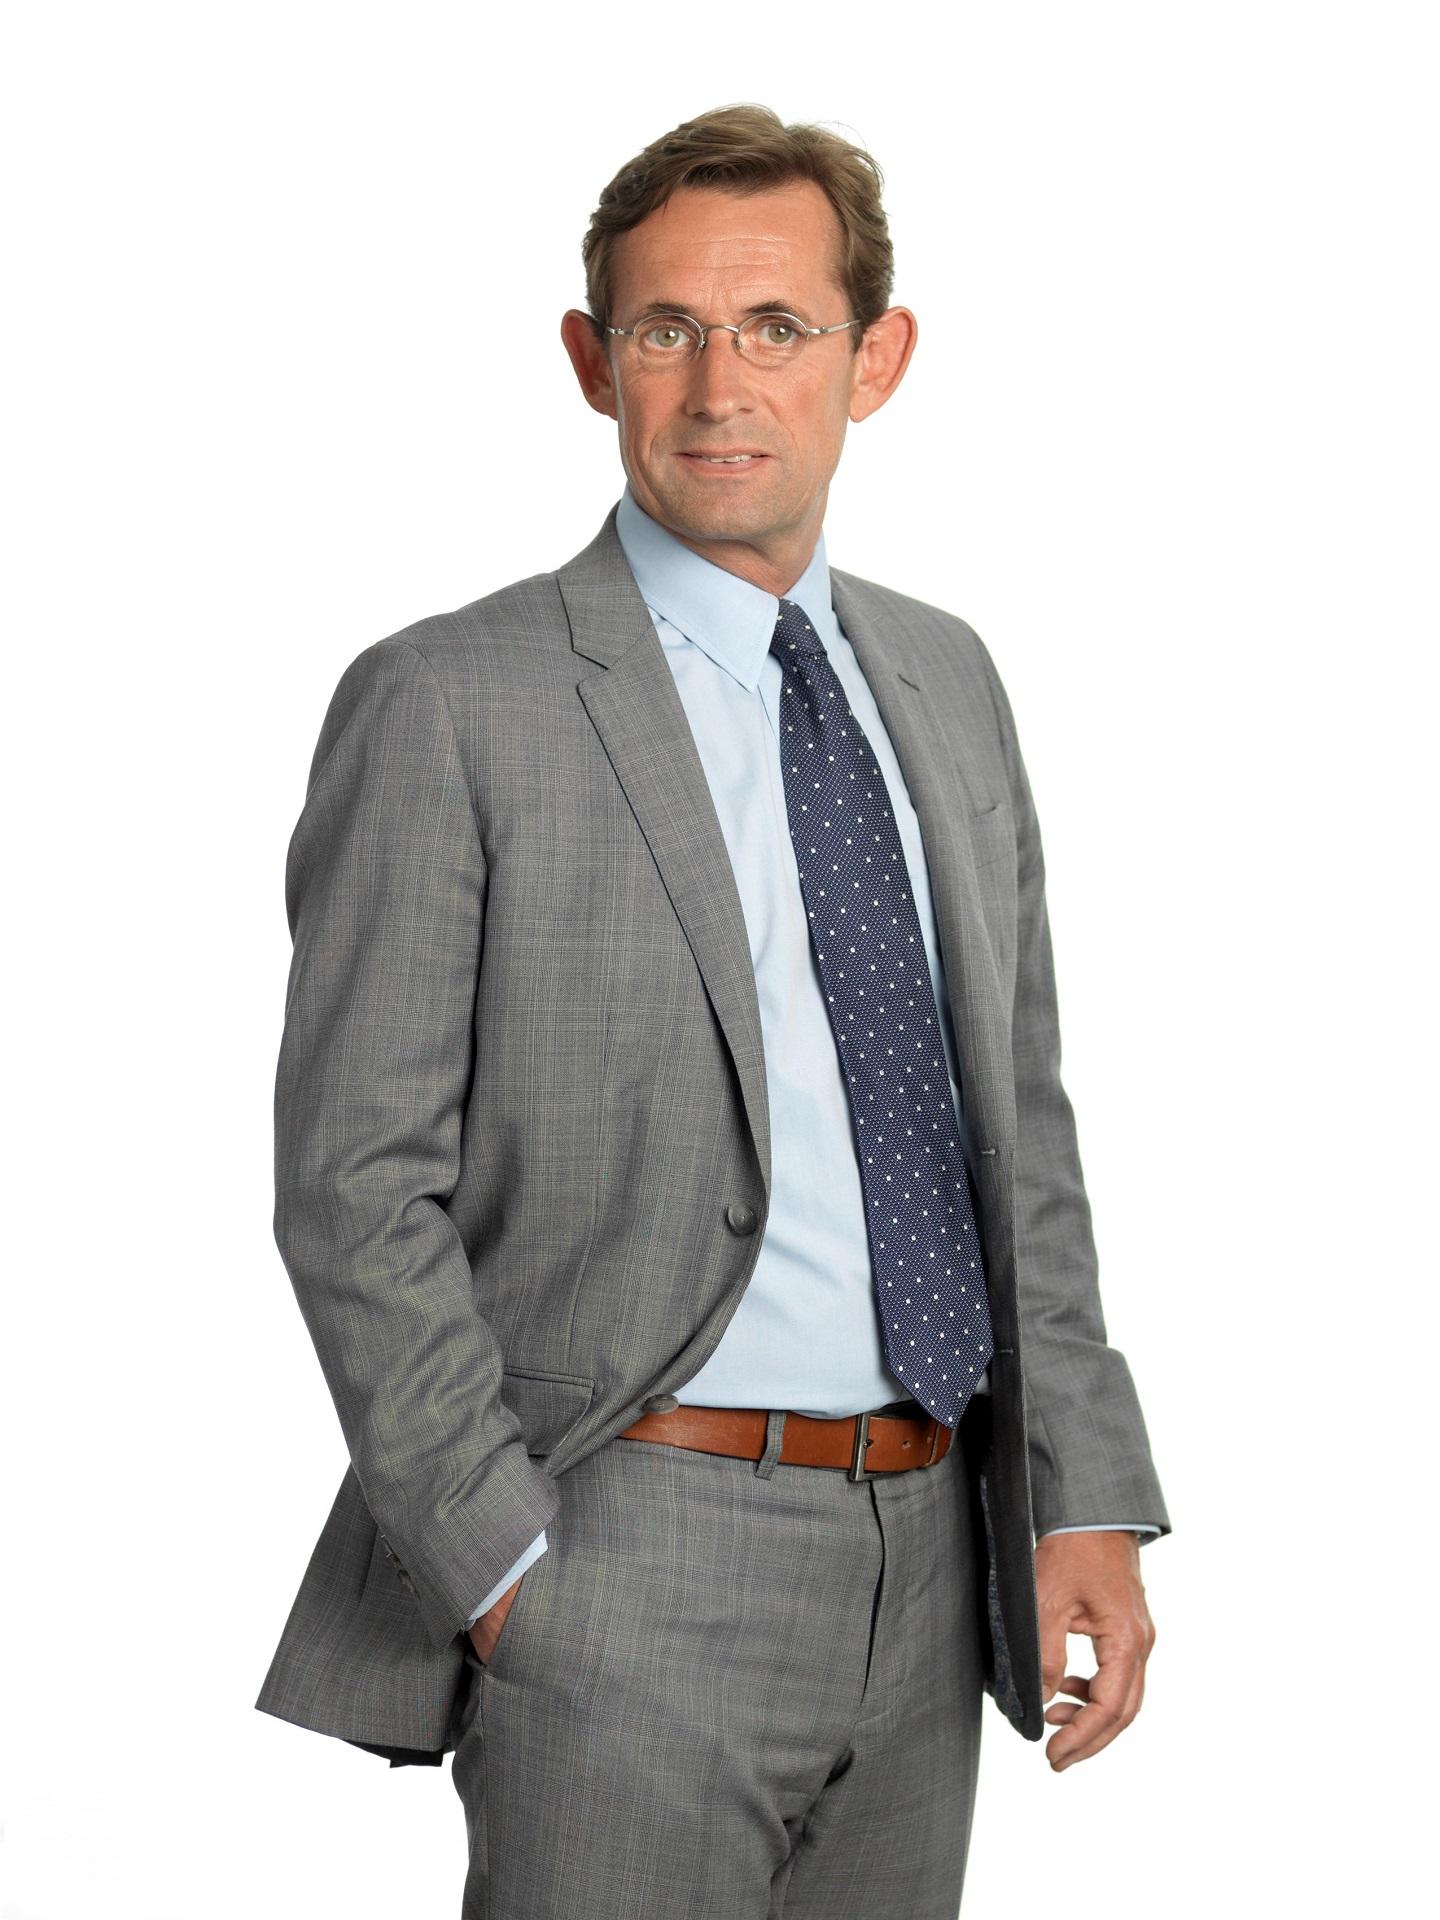 Lex Kerssemakers - Senior Vice President Americas Volvo XC90